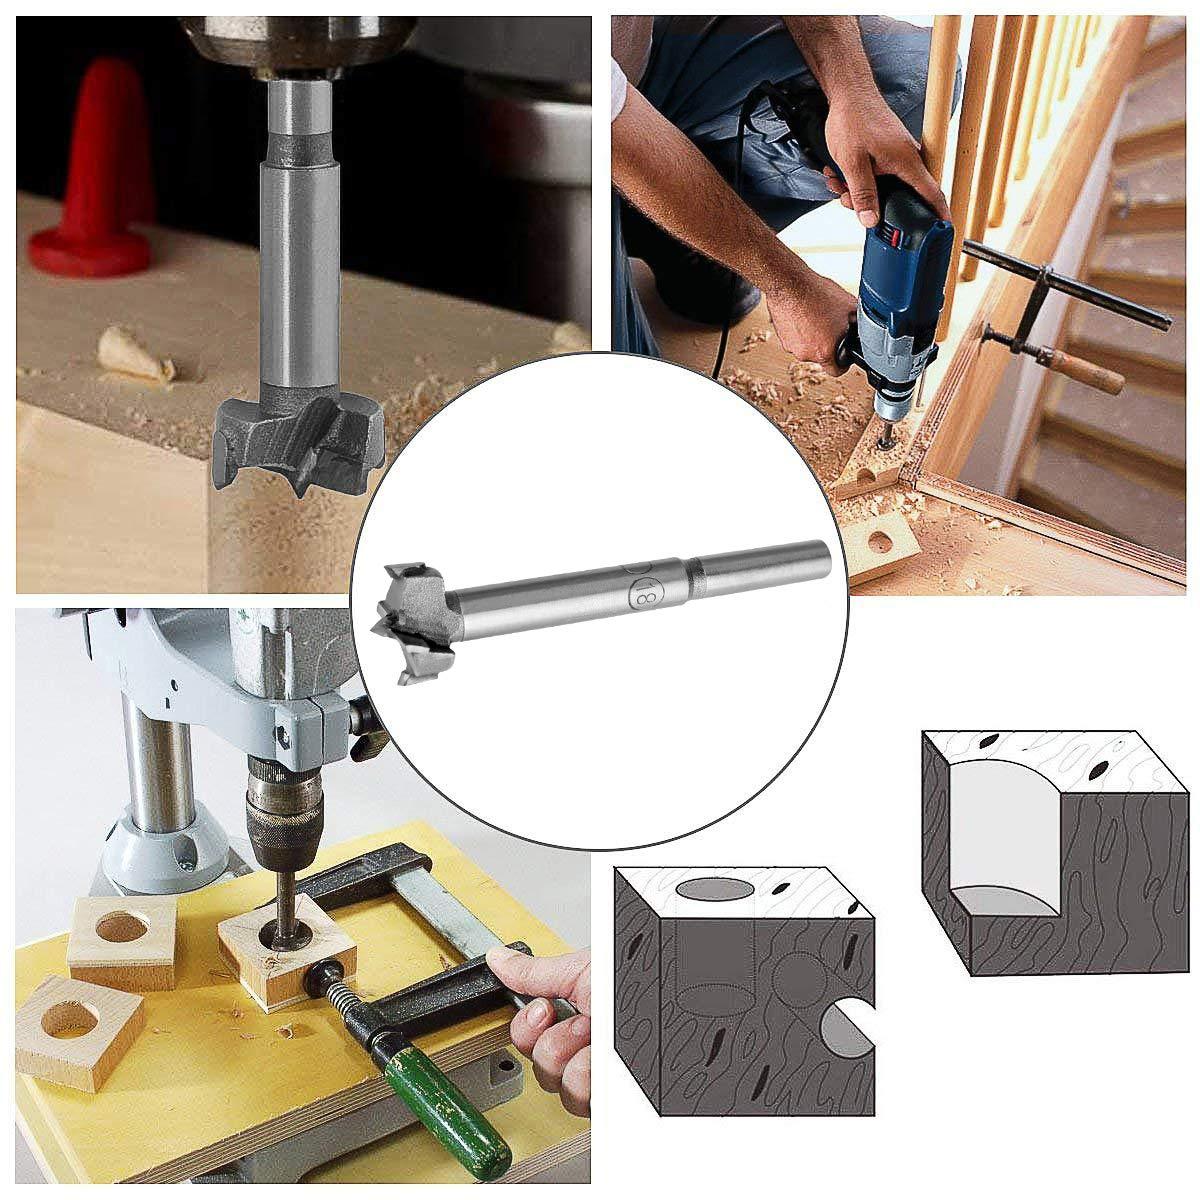 Carbide Forstner Bits Flat Wing Drilling Hole Hinge Woodworking Hole Drill Bit WEAVERBIRD Forstner Drill Bit 15mm 1 Piece